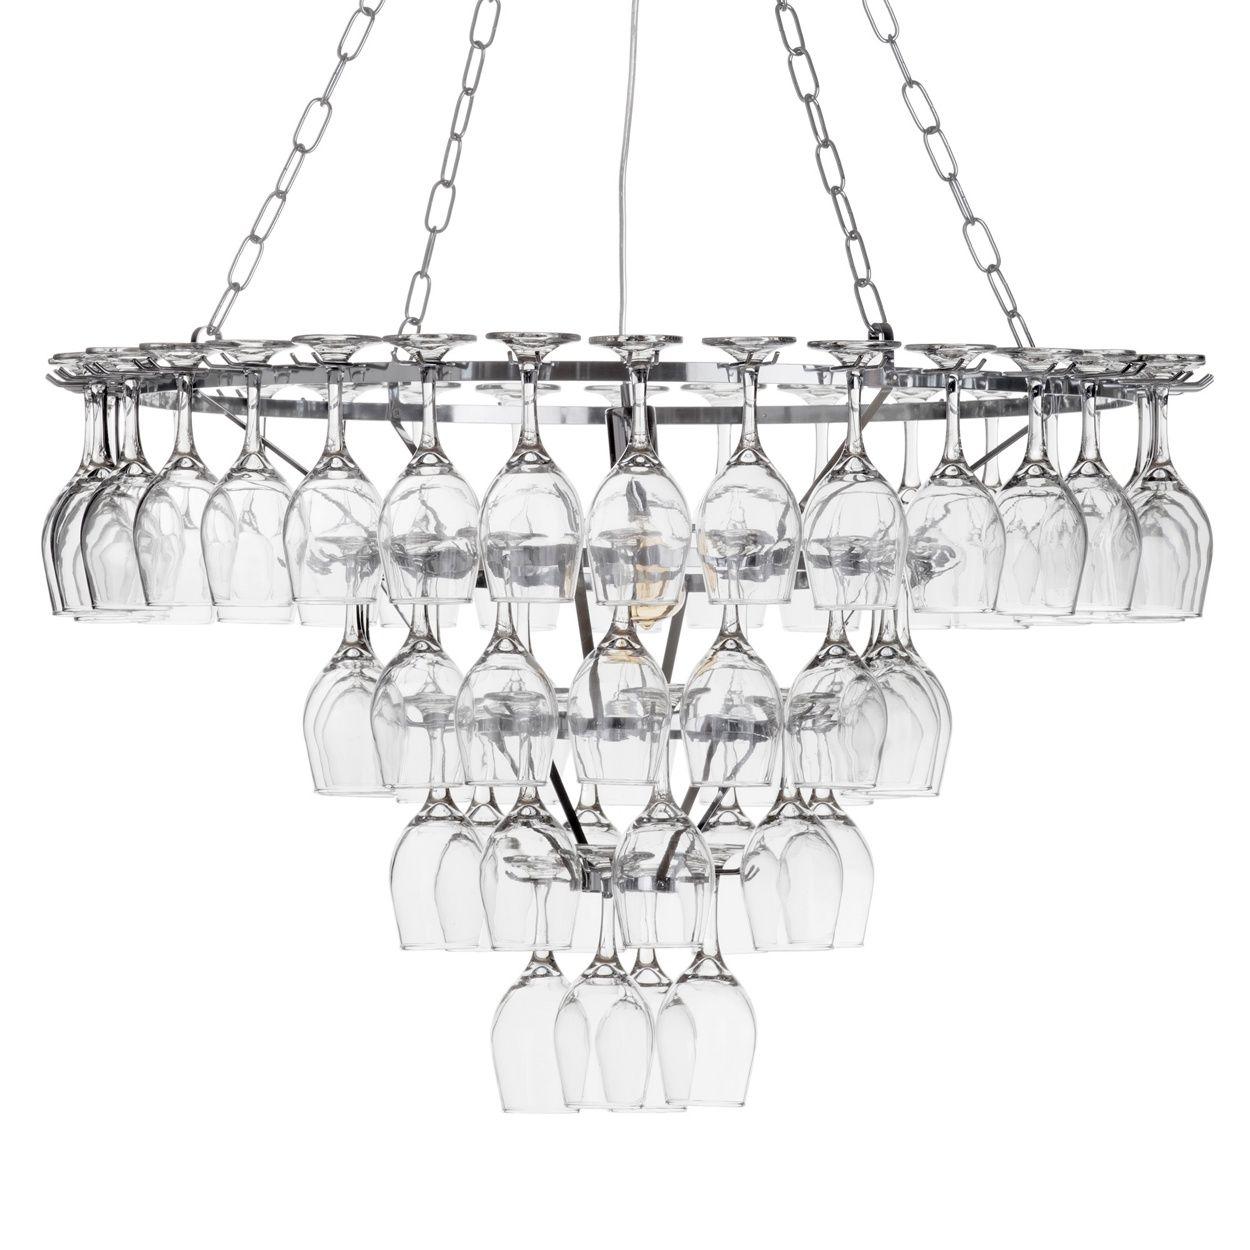 Litecraft 4 tier 1 light 60 wine glass chandelier chrome litecraft 4 tier 1 light 60 wine glass chandelier chrome debenhams arubaitofo Choice Image